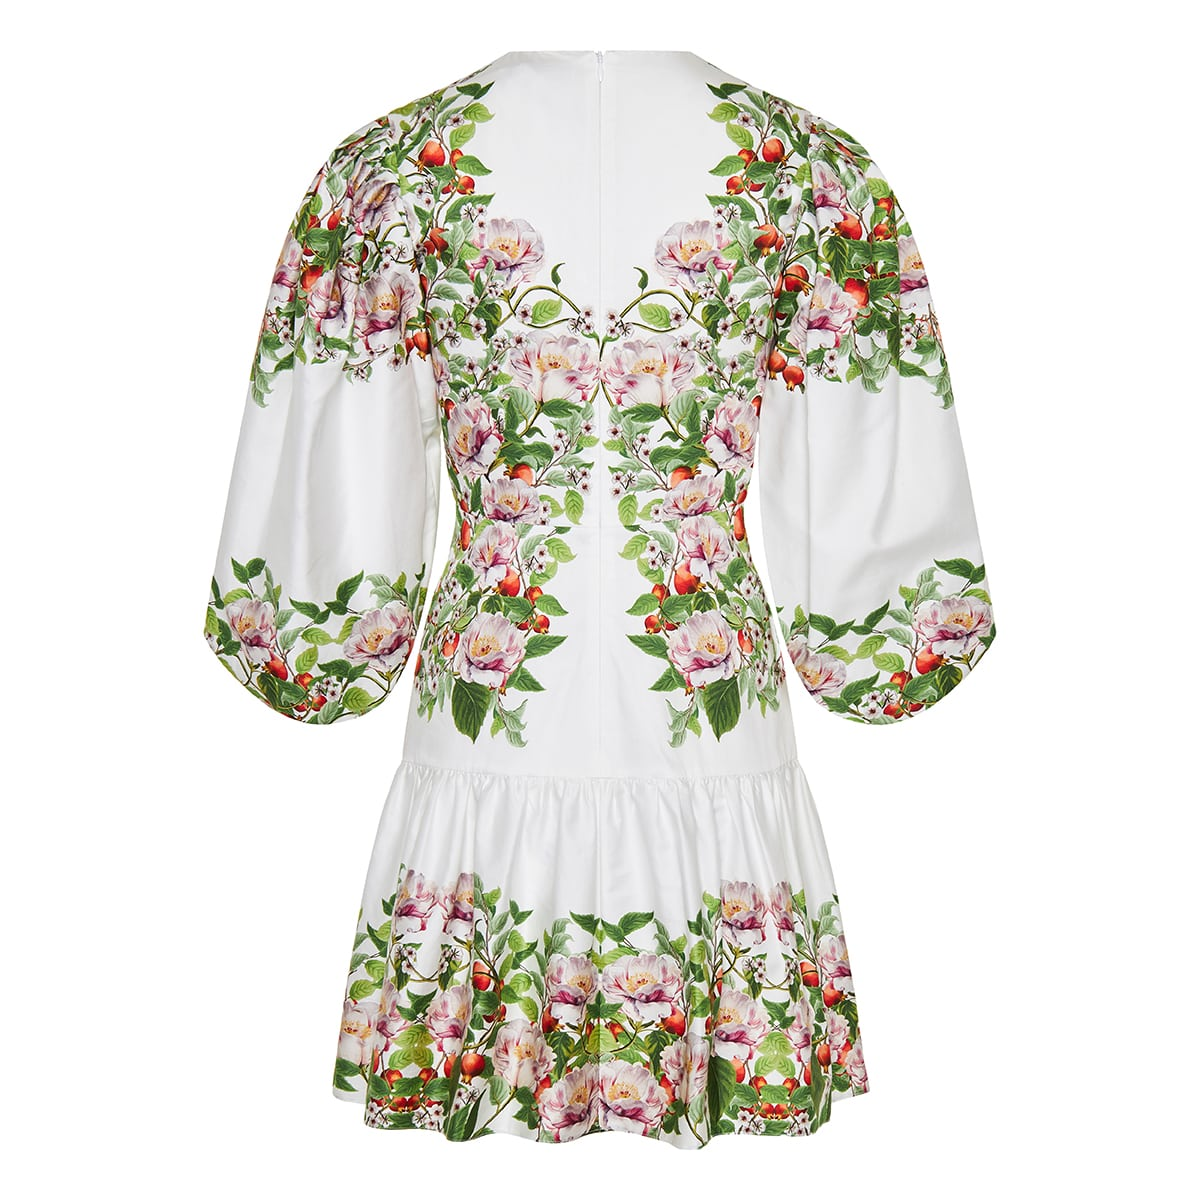 Tabitha floral mini dress